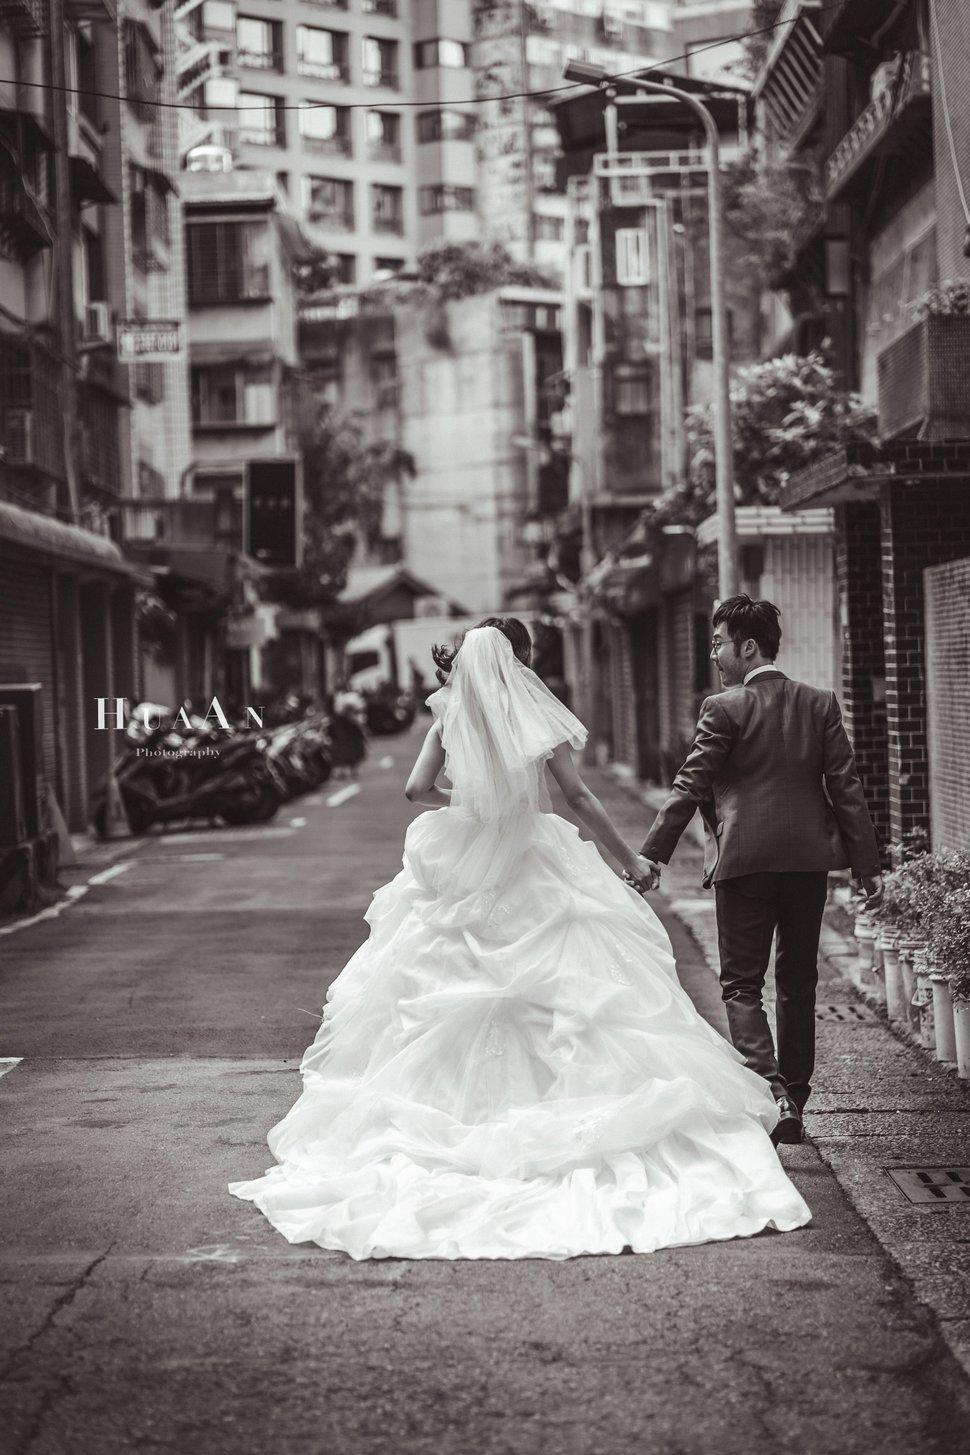 DSC01722 - Huaan Photography《結婚吧》